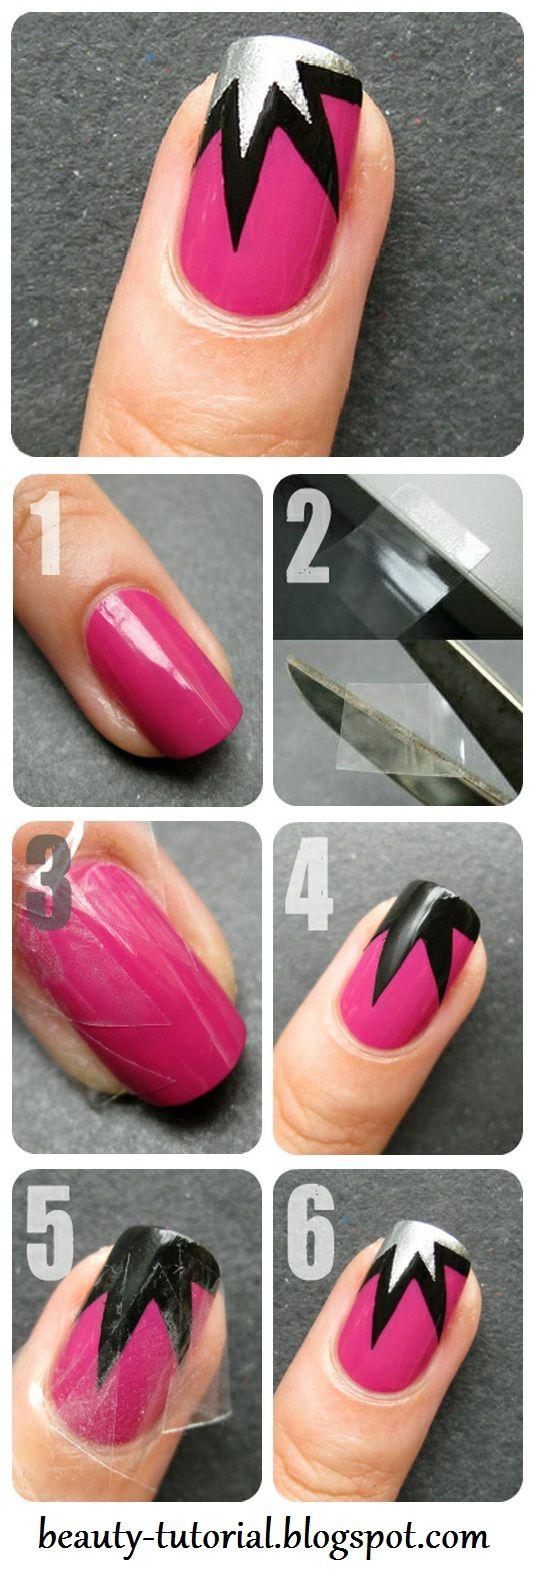 Explosion nail art design tape manicure tutorial